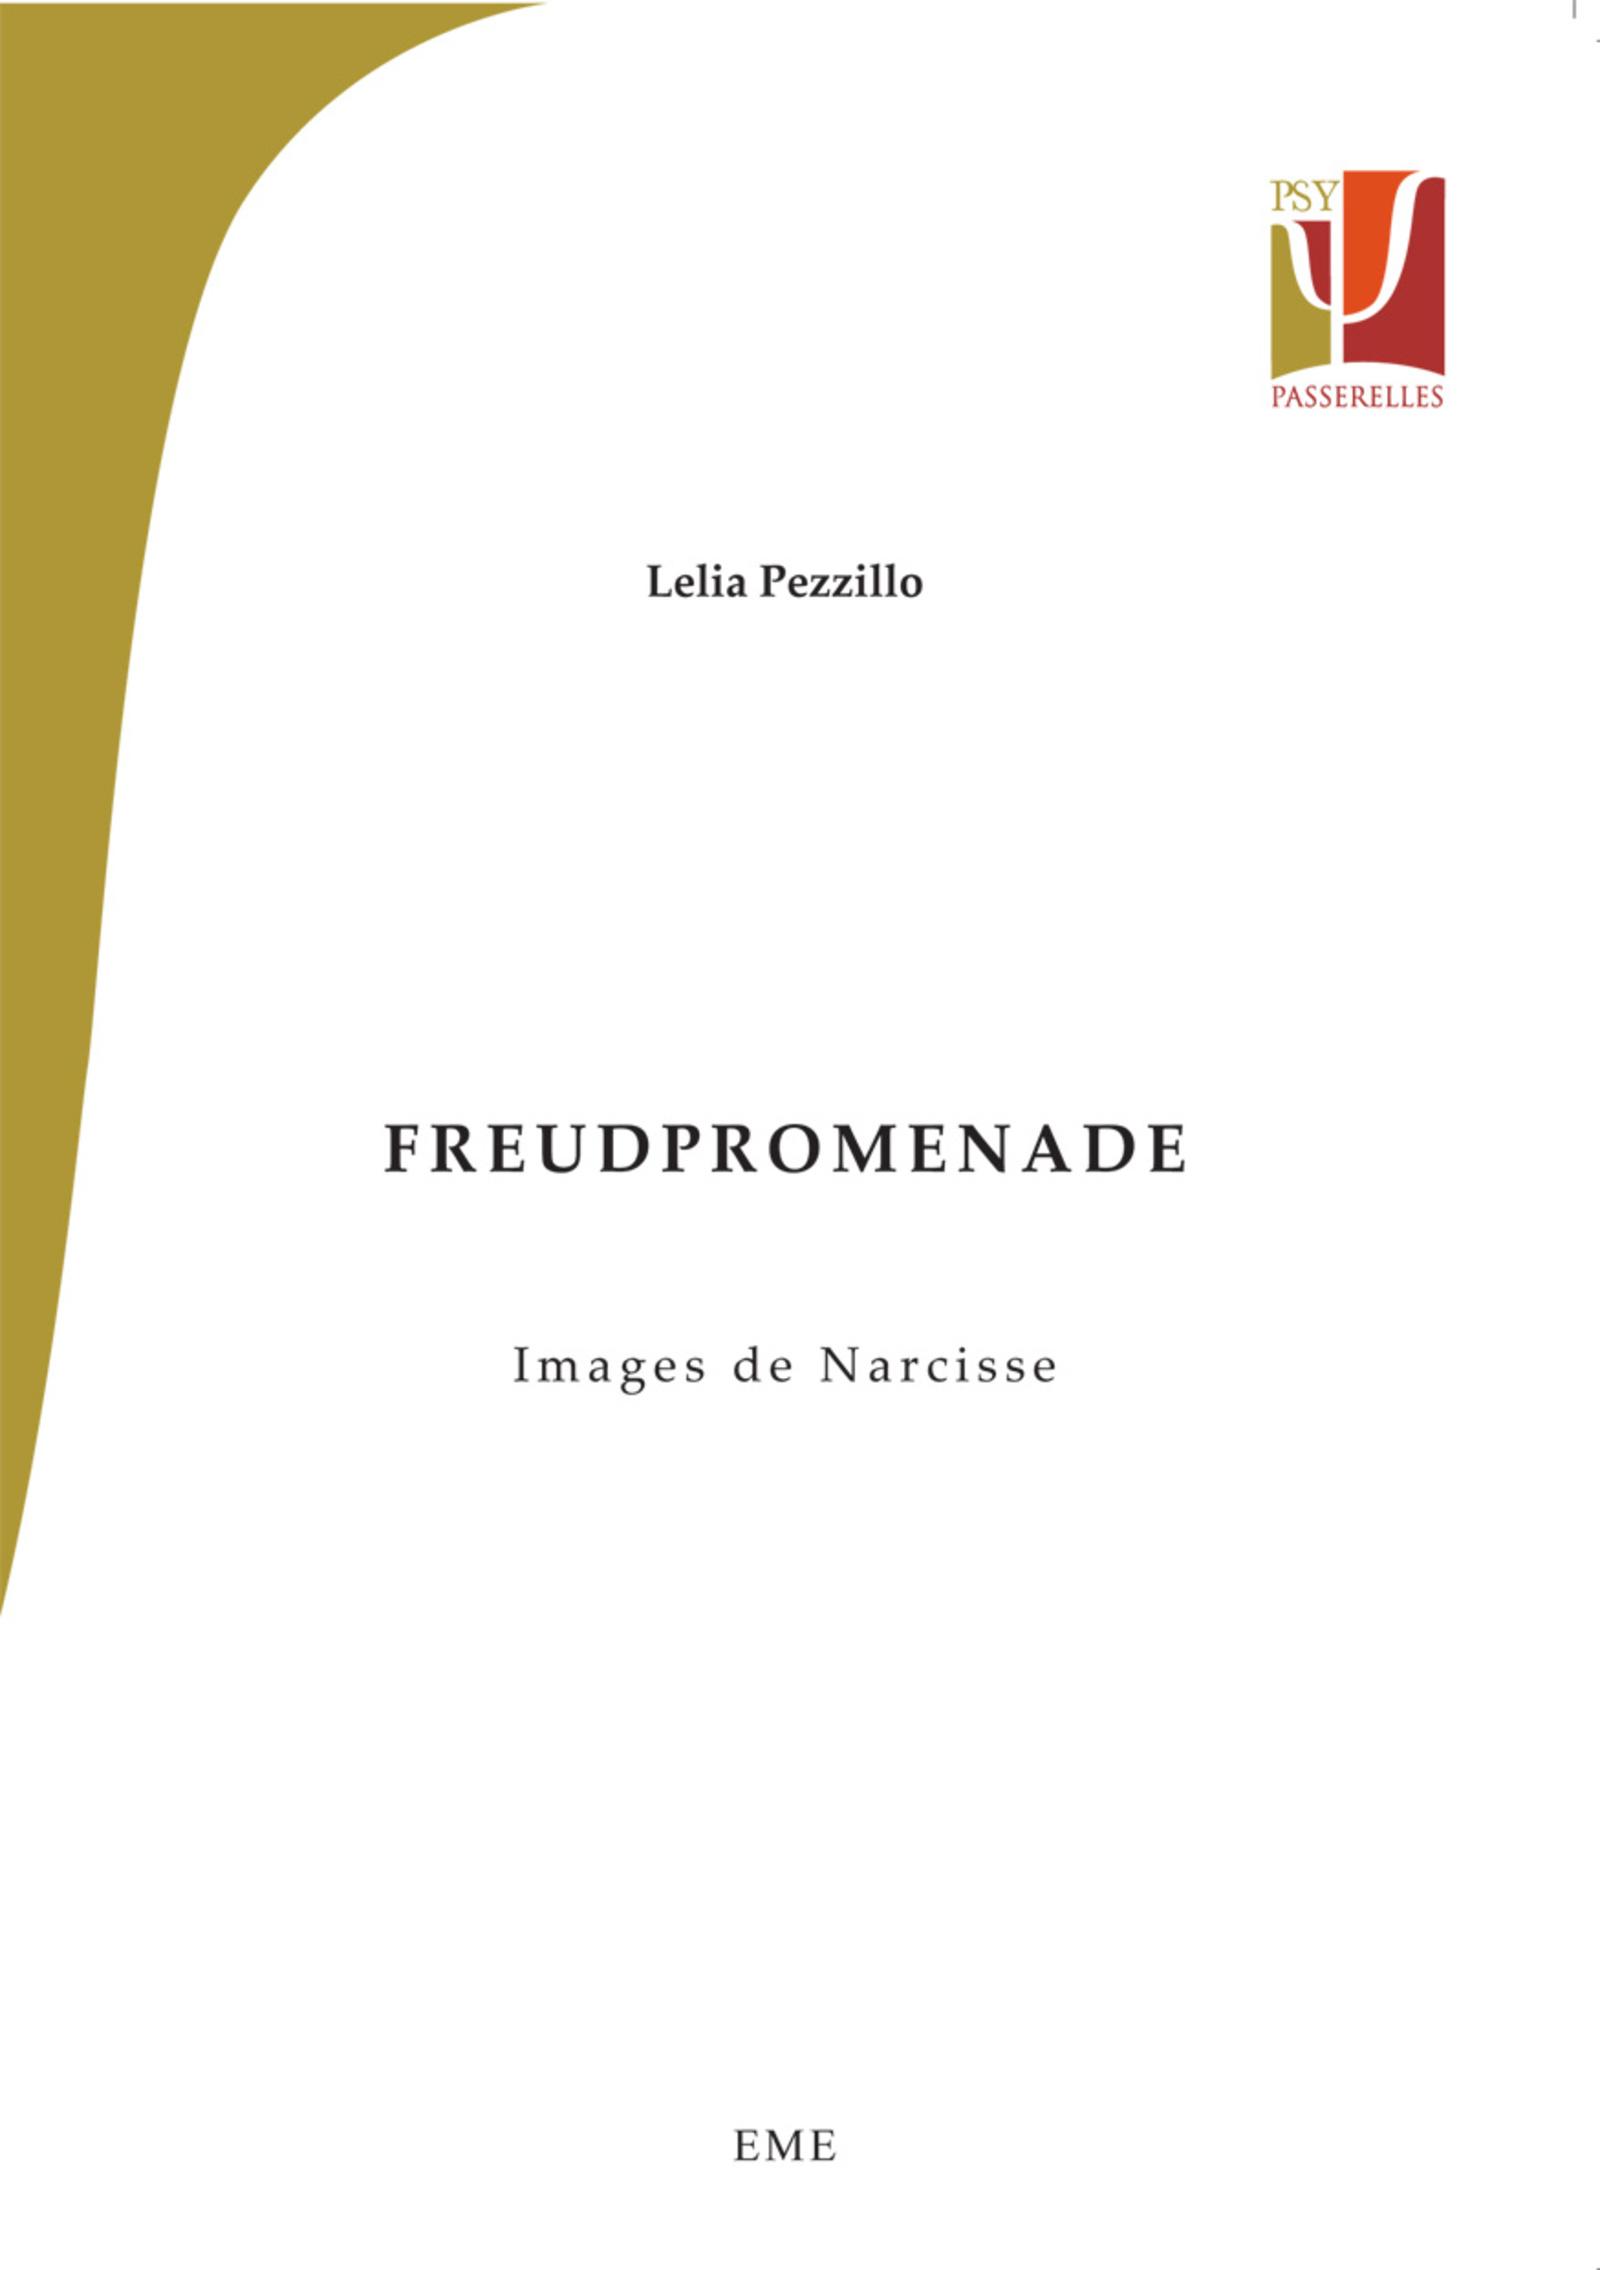 Freud Promenade